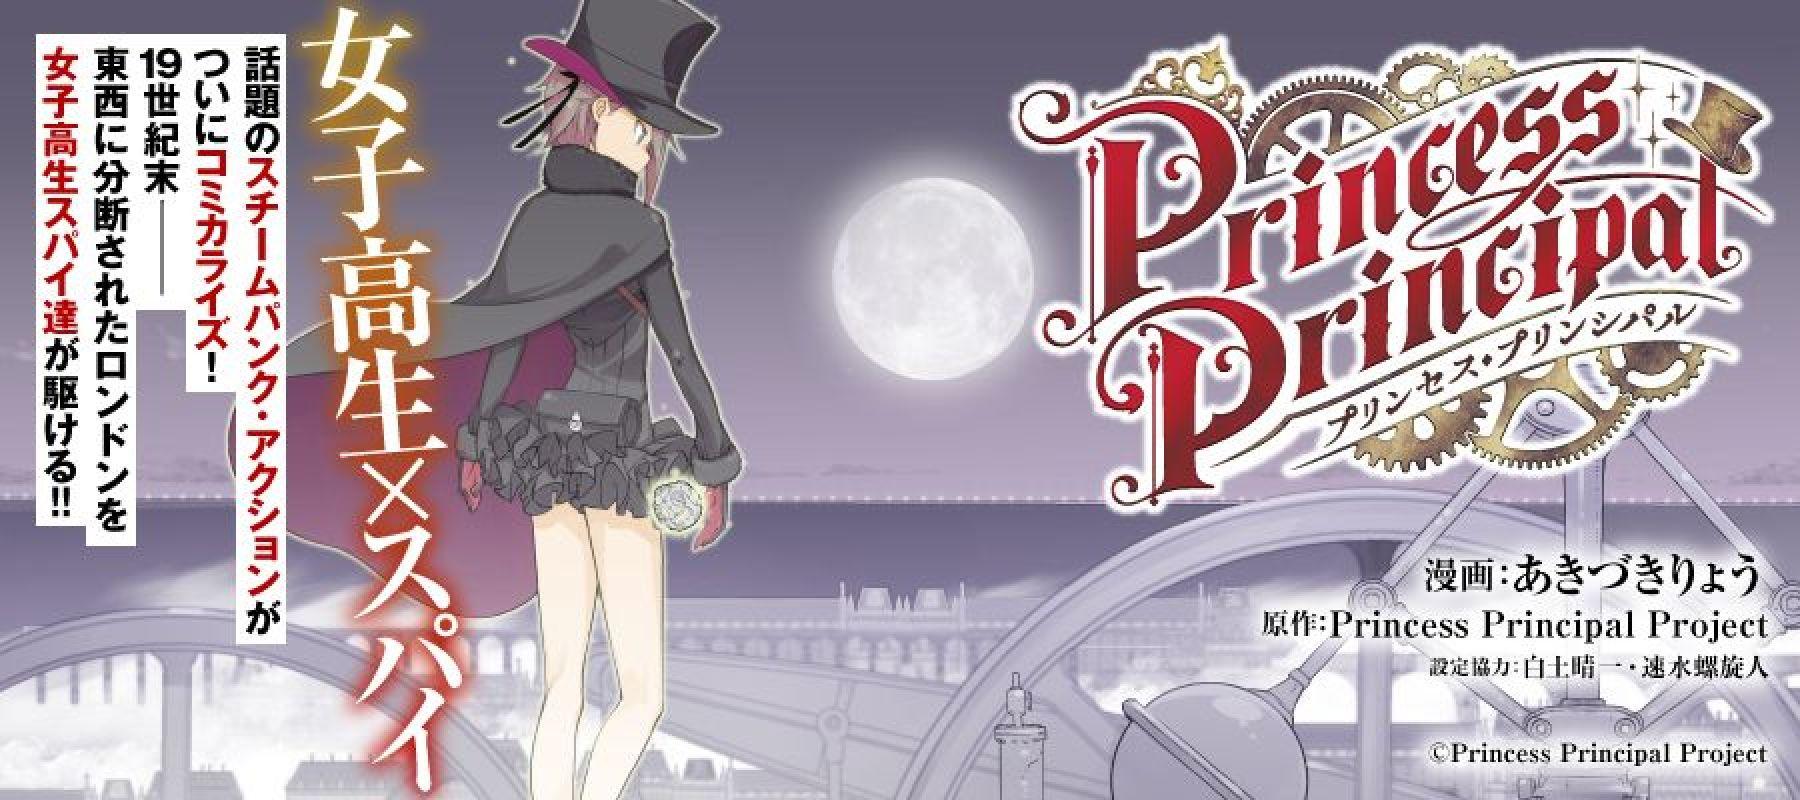 Une adaptation en manga pour Princess Principal